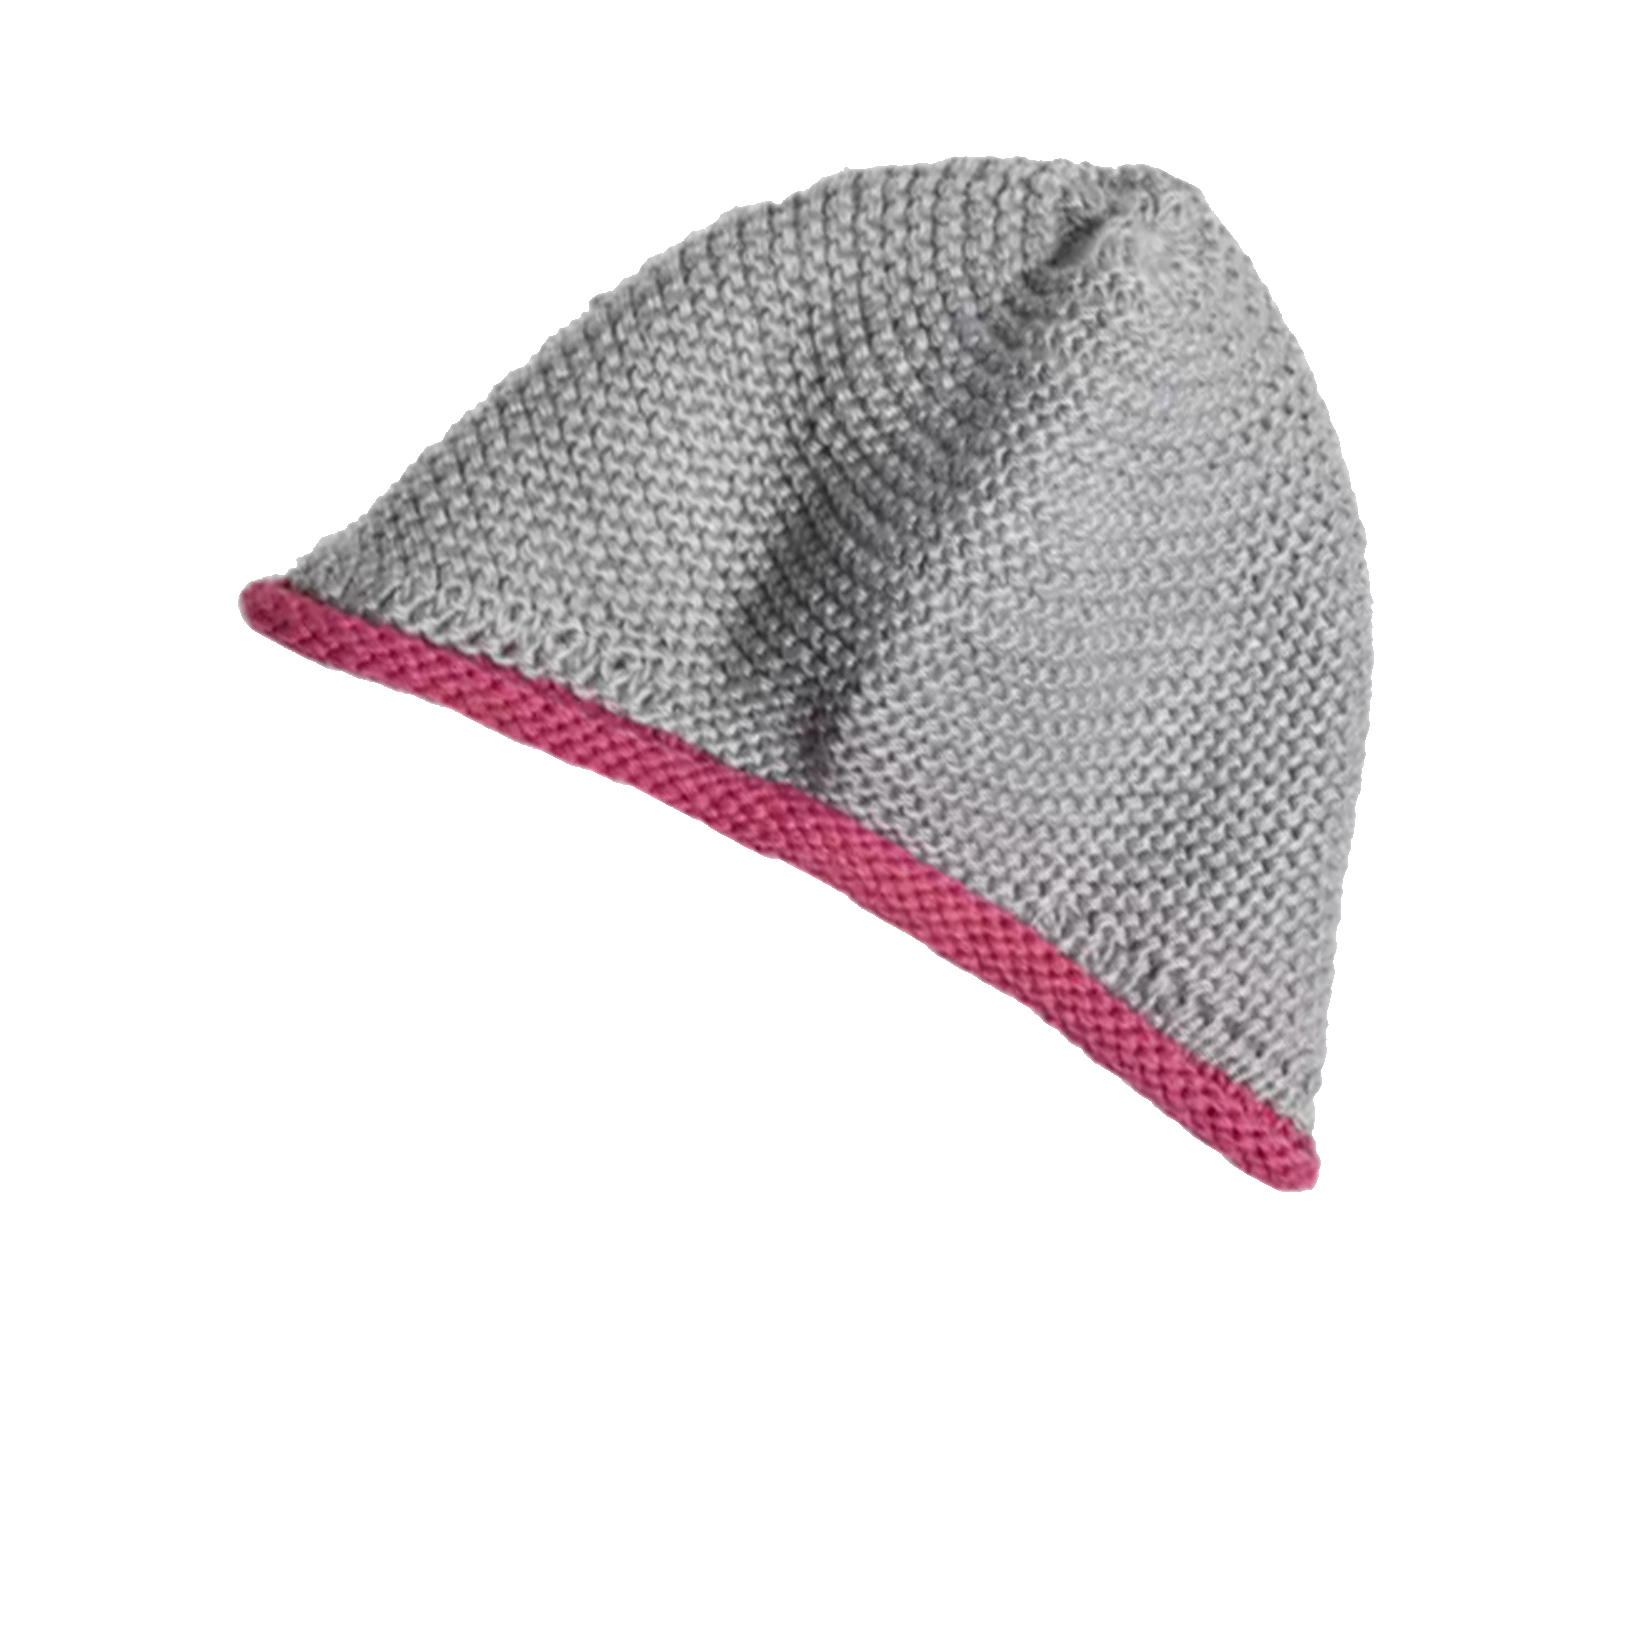 Adidas Knit Beanie Grey - Pink